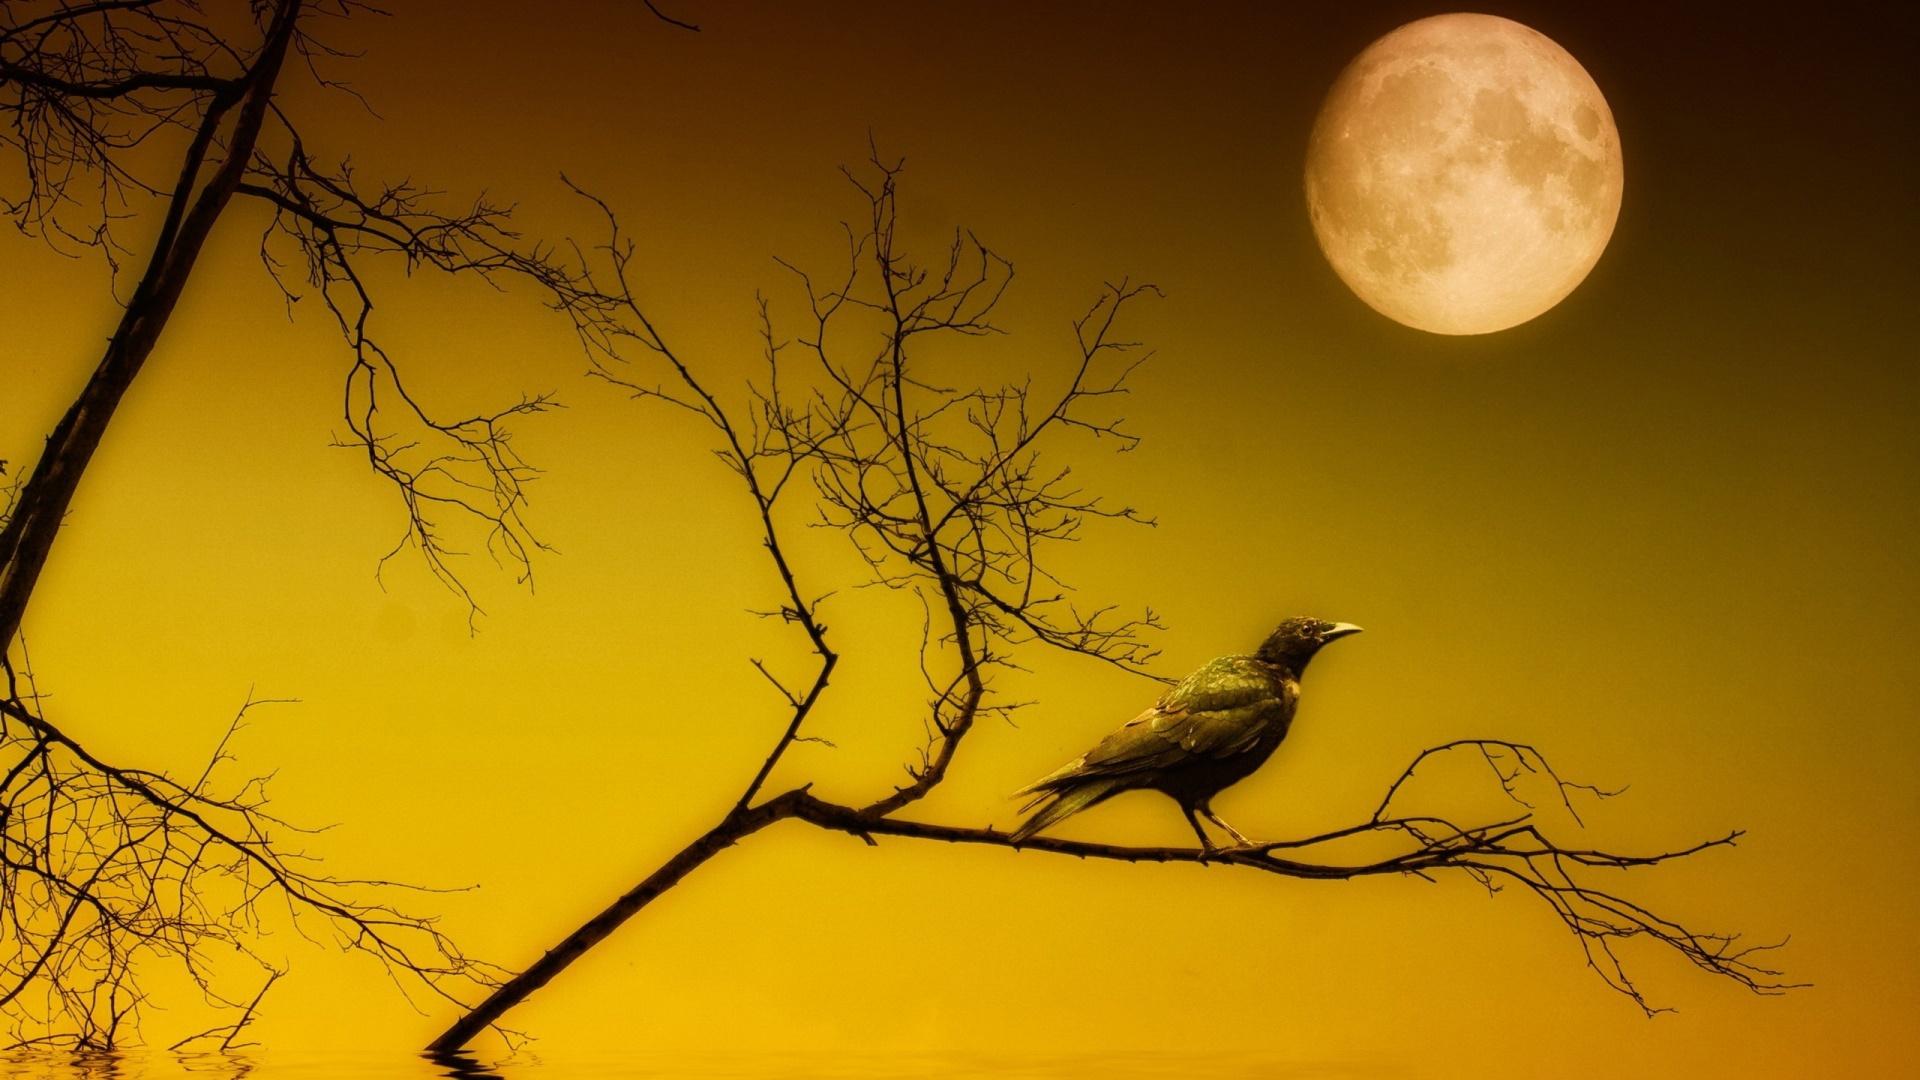 Crow at full moon wallpaper